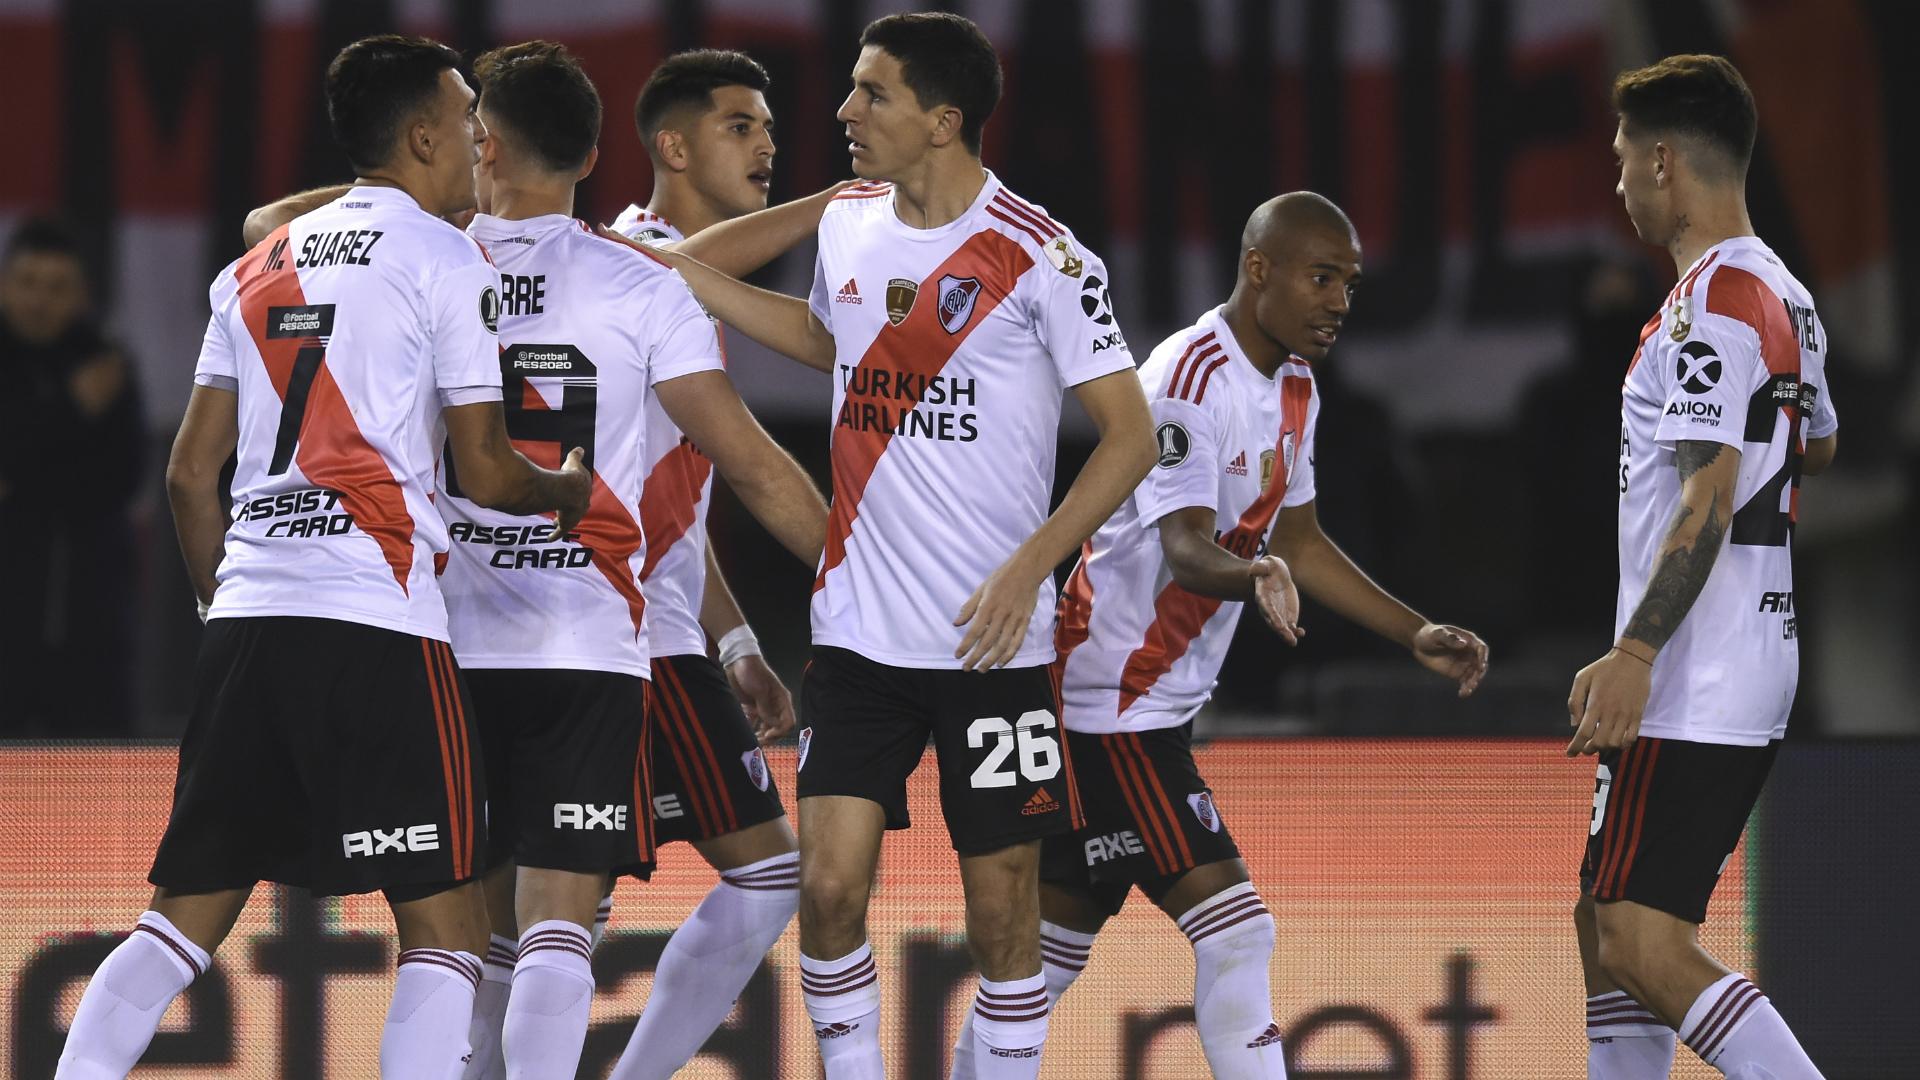 Ignacio Fernandez and Rafael Borre both scored penalties to lead River Plate past Cerro Porteno in Buenos Aires on Thursday.